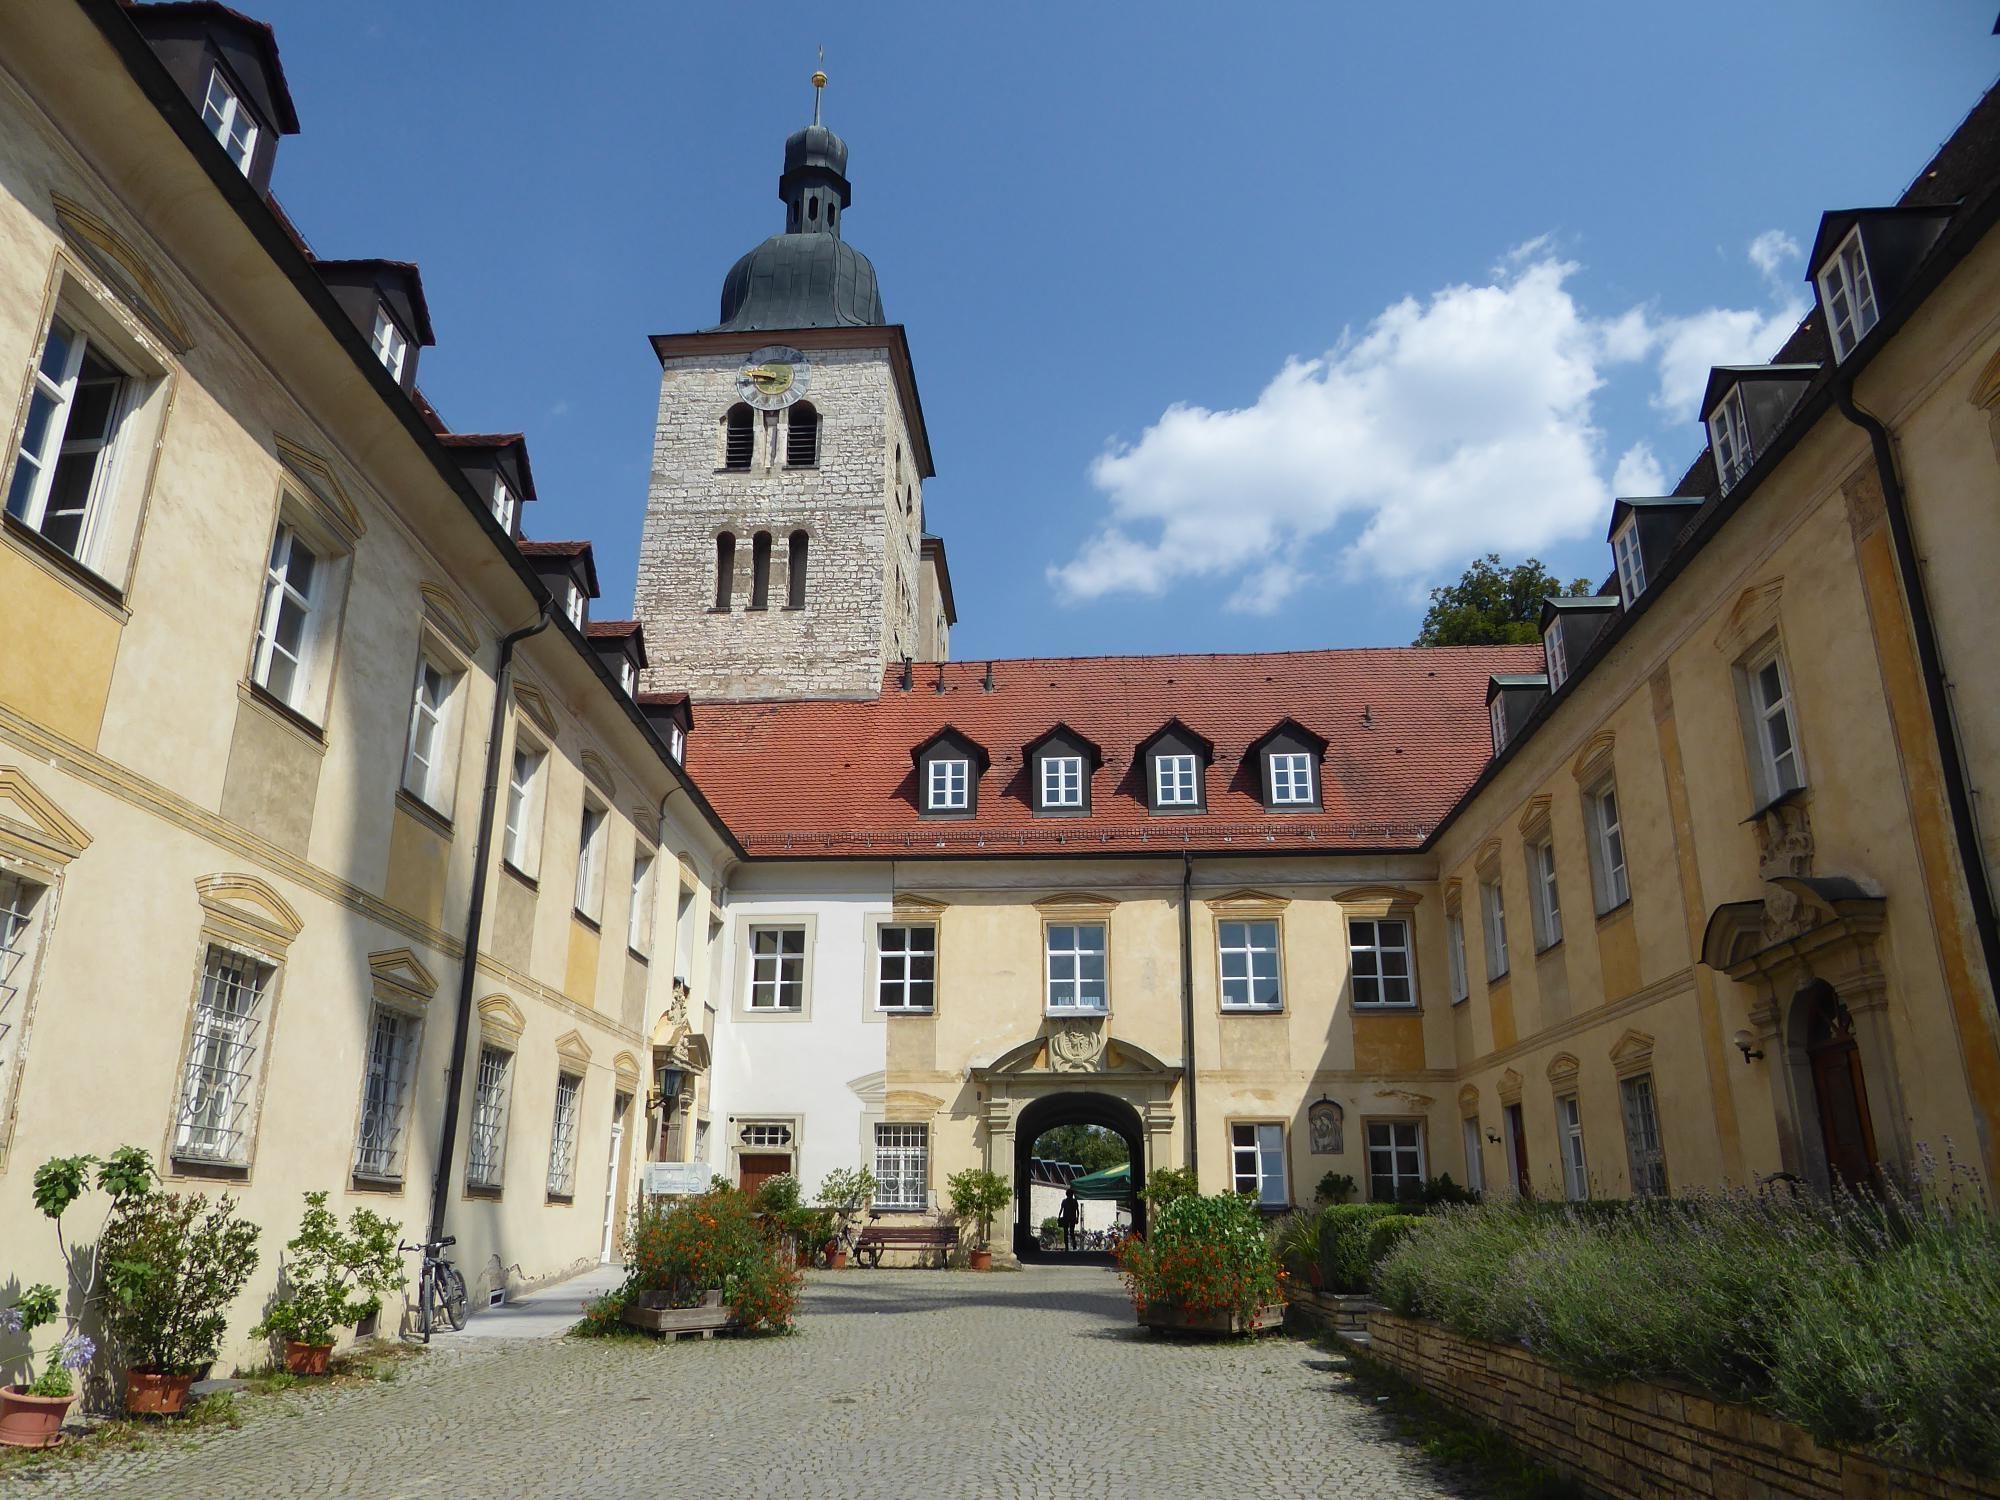 Sommerserie Spirtuelles Reisen Kloster Plankstetten 09 08 2020 19